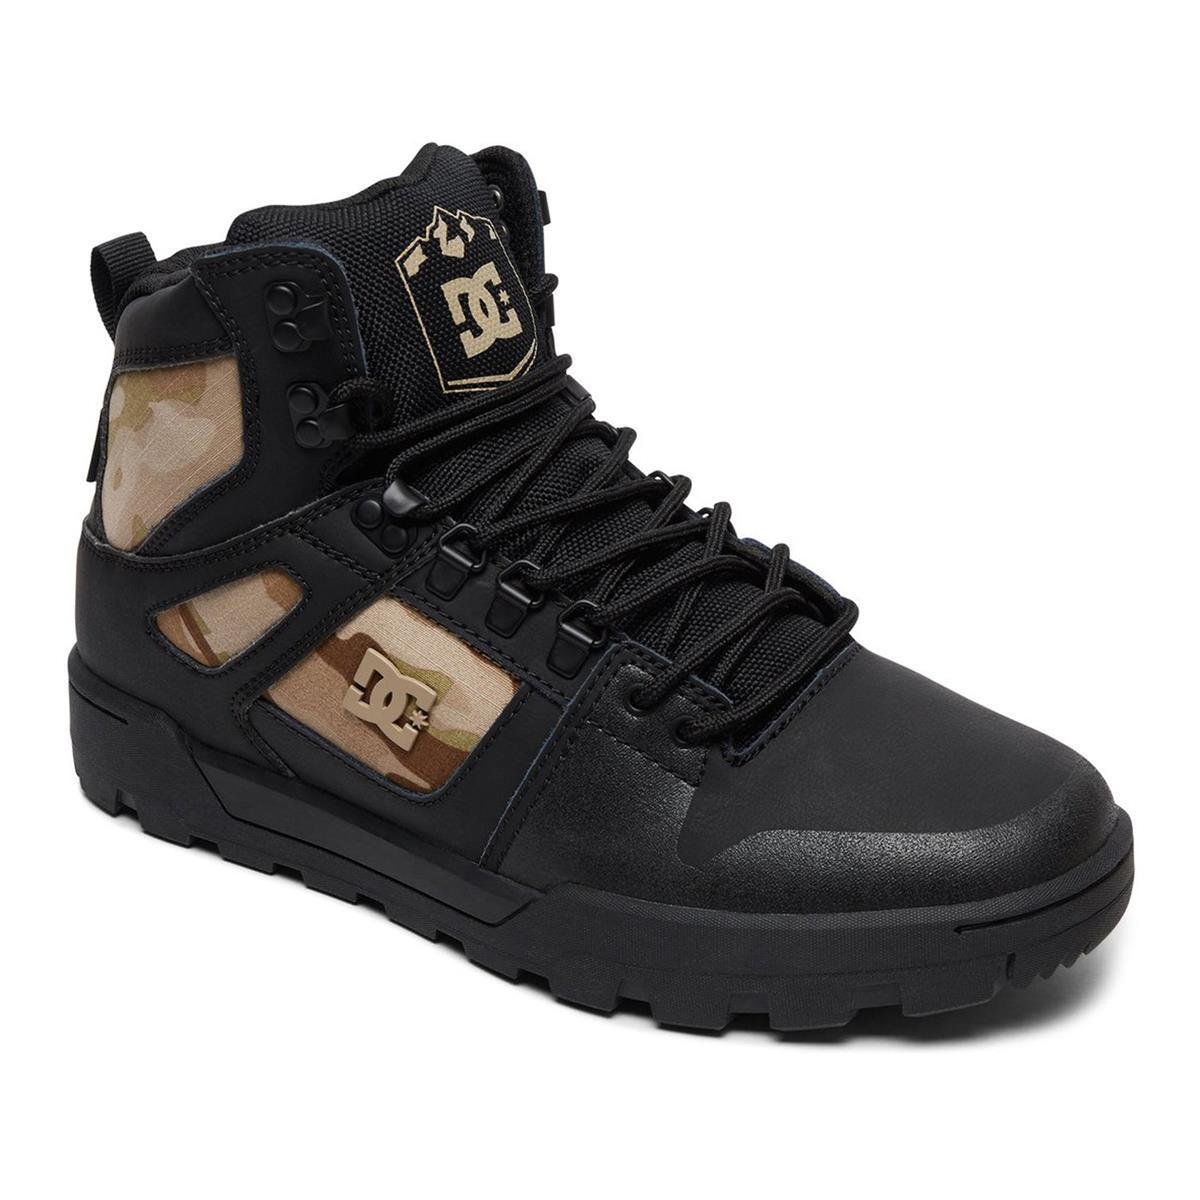 DC Schuhe Pure High Top WR Boot Schwarz/Camo